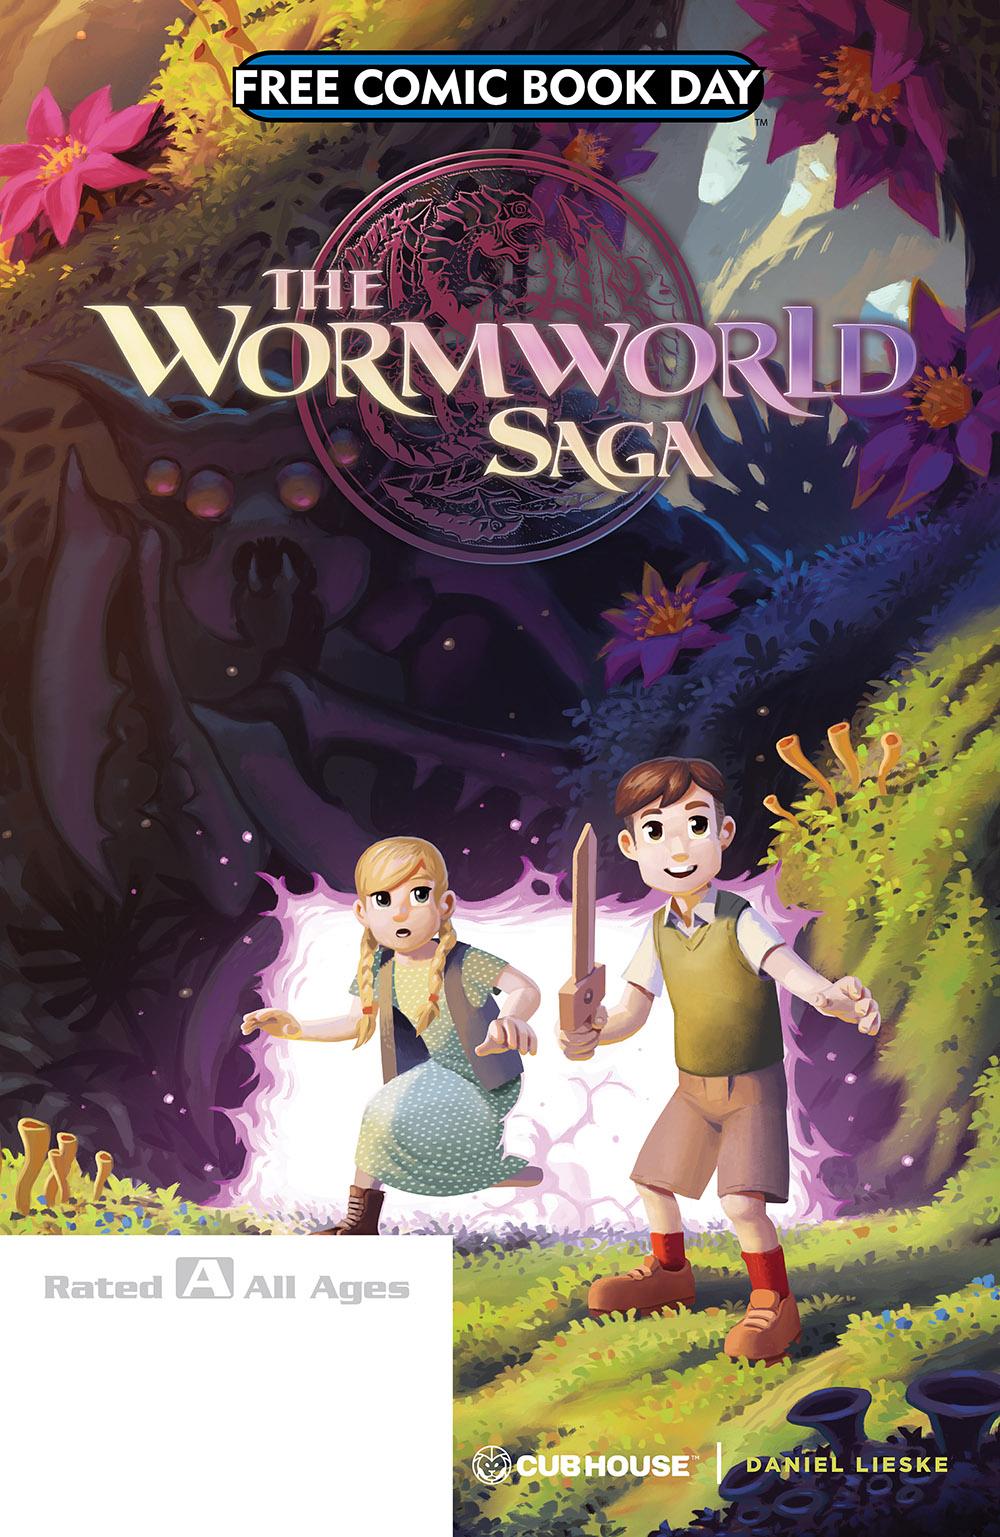 FCBD18_S_Lion Forge_Worm World Saga.jpg